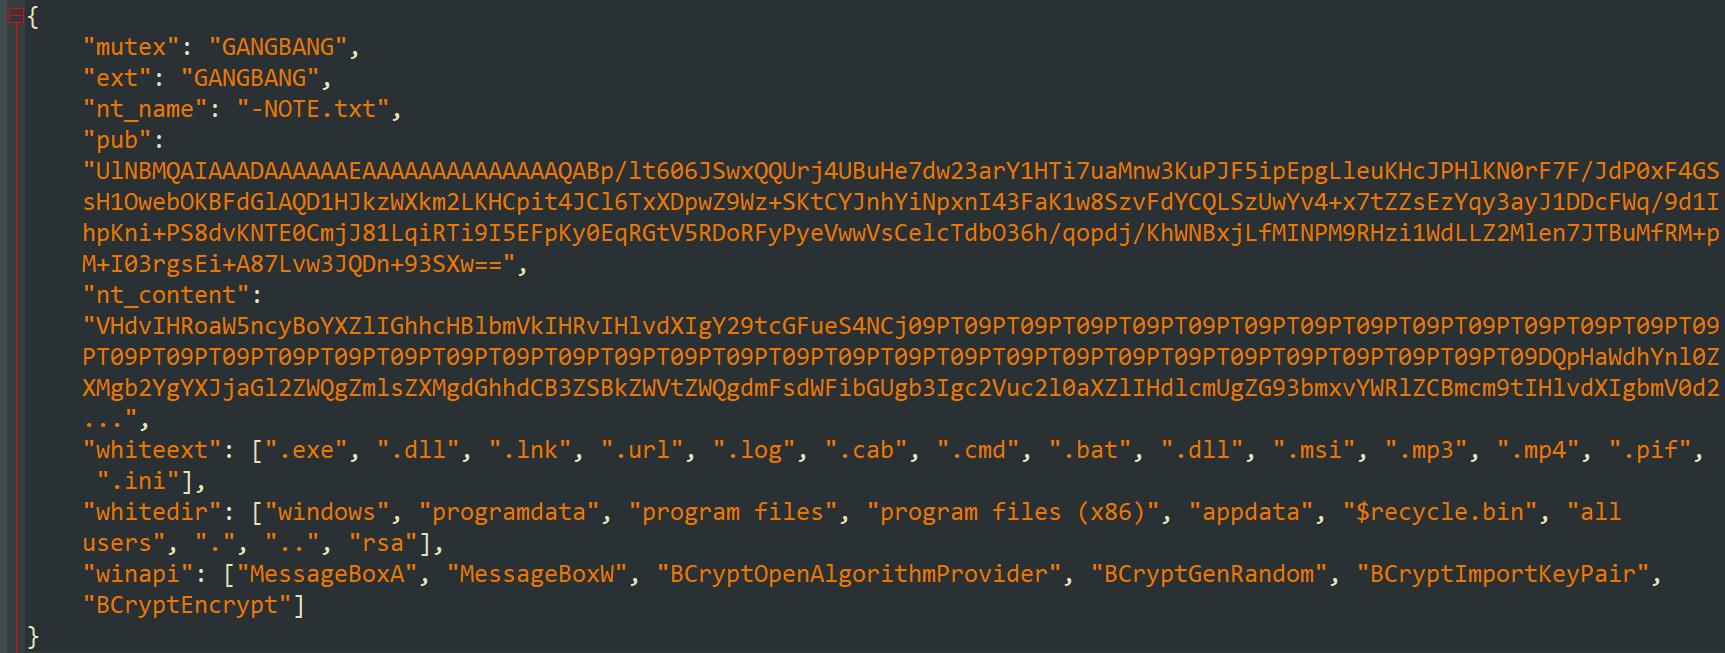 JSworm malware 23